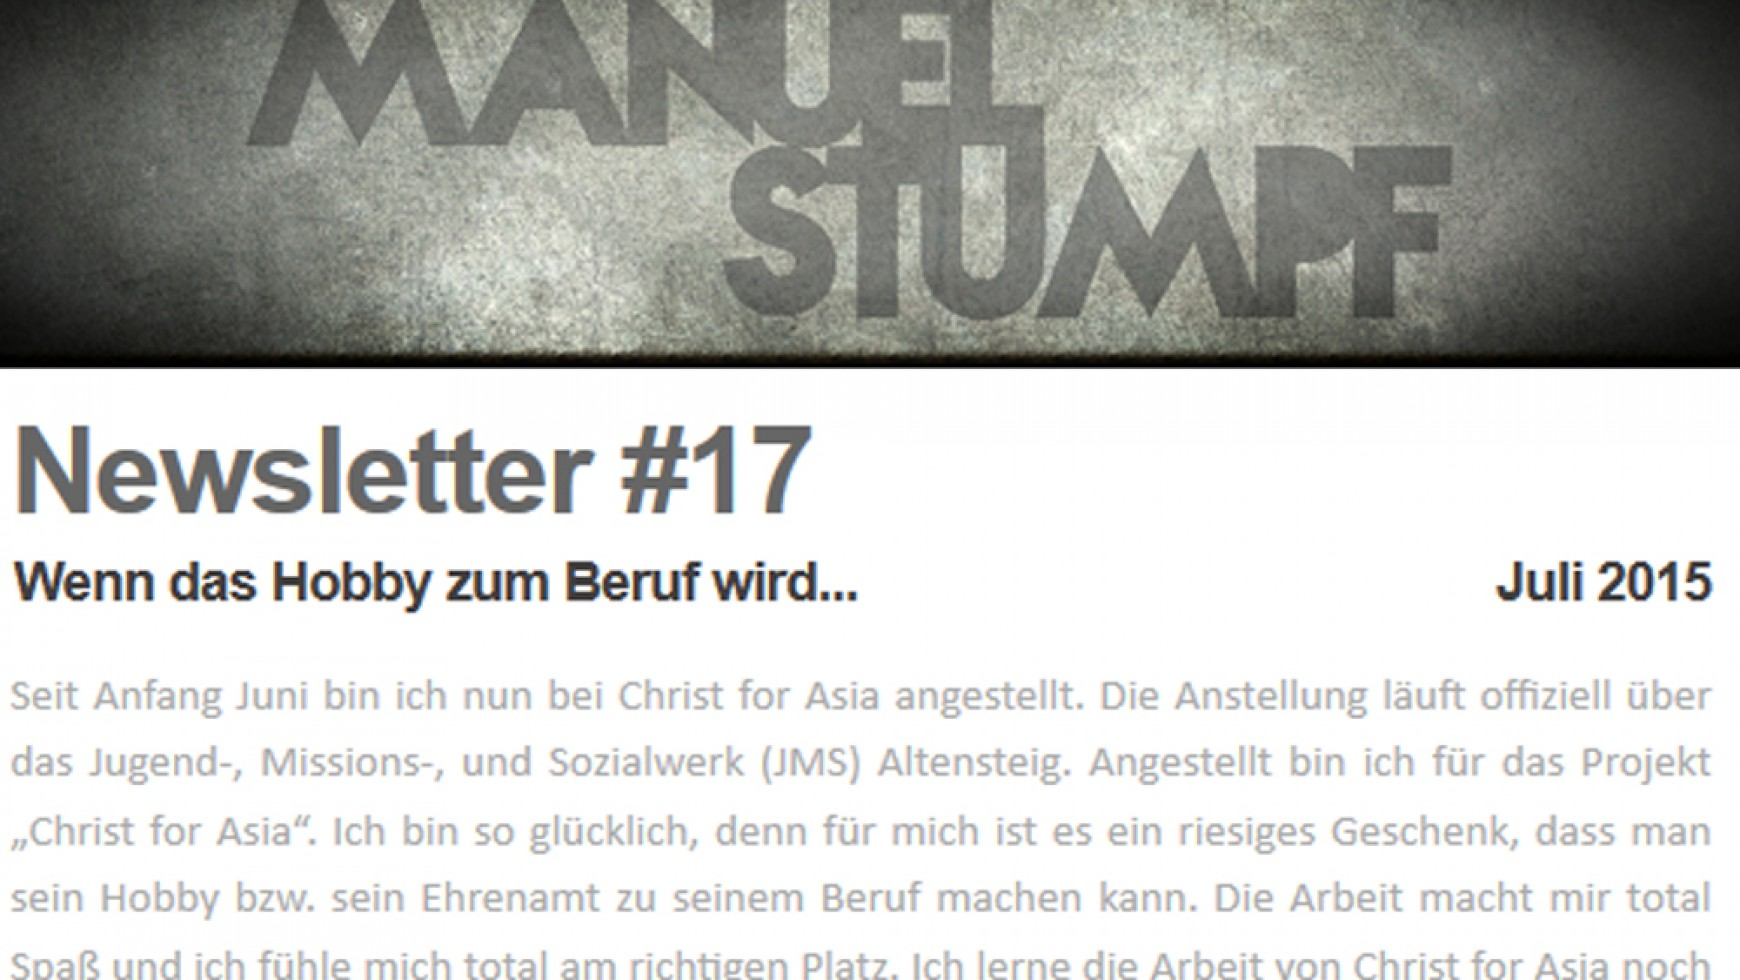 ManU's Newsletter #17